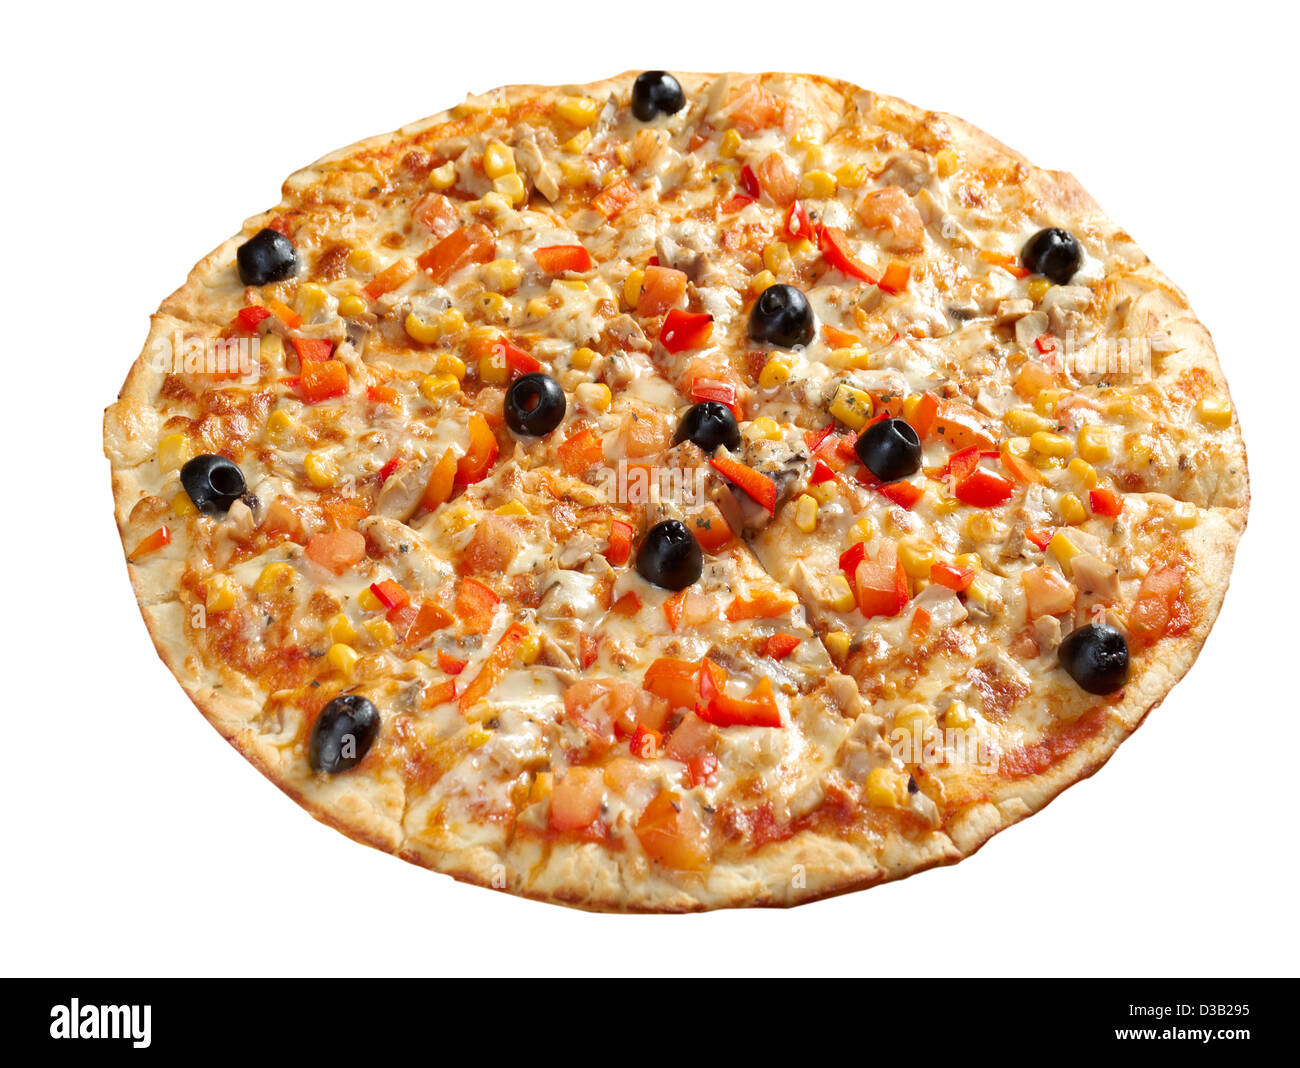 Pizza vegetarian. italian kitchen. Studio - Stock Image